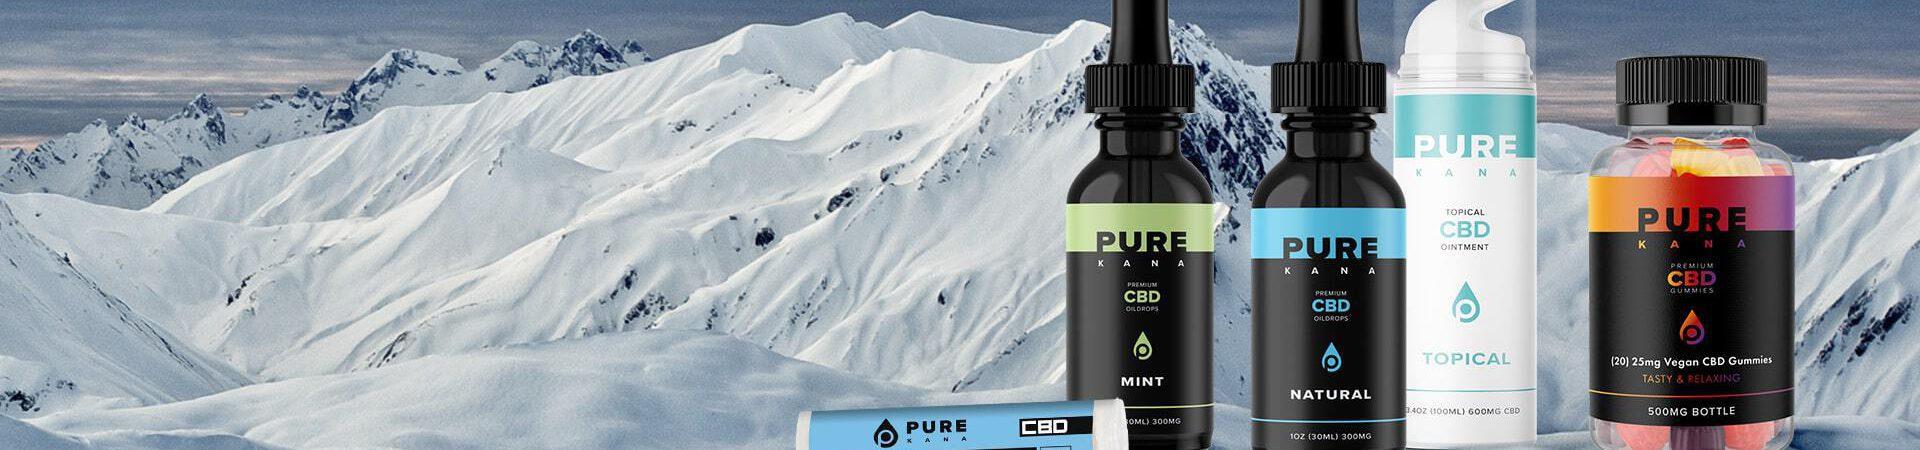 PureKana CBD Oil (2019 Review + Valid Coupon)